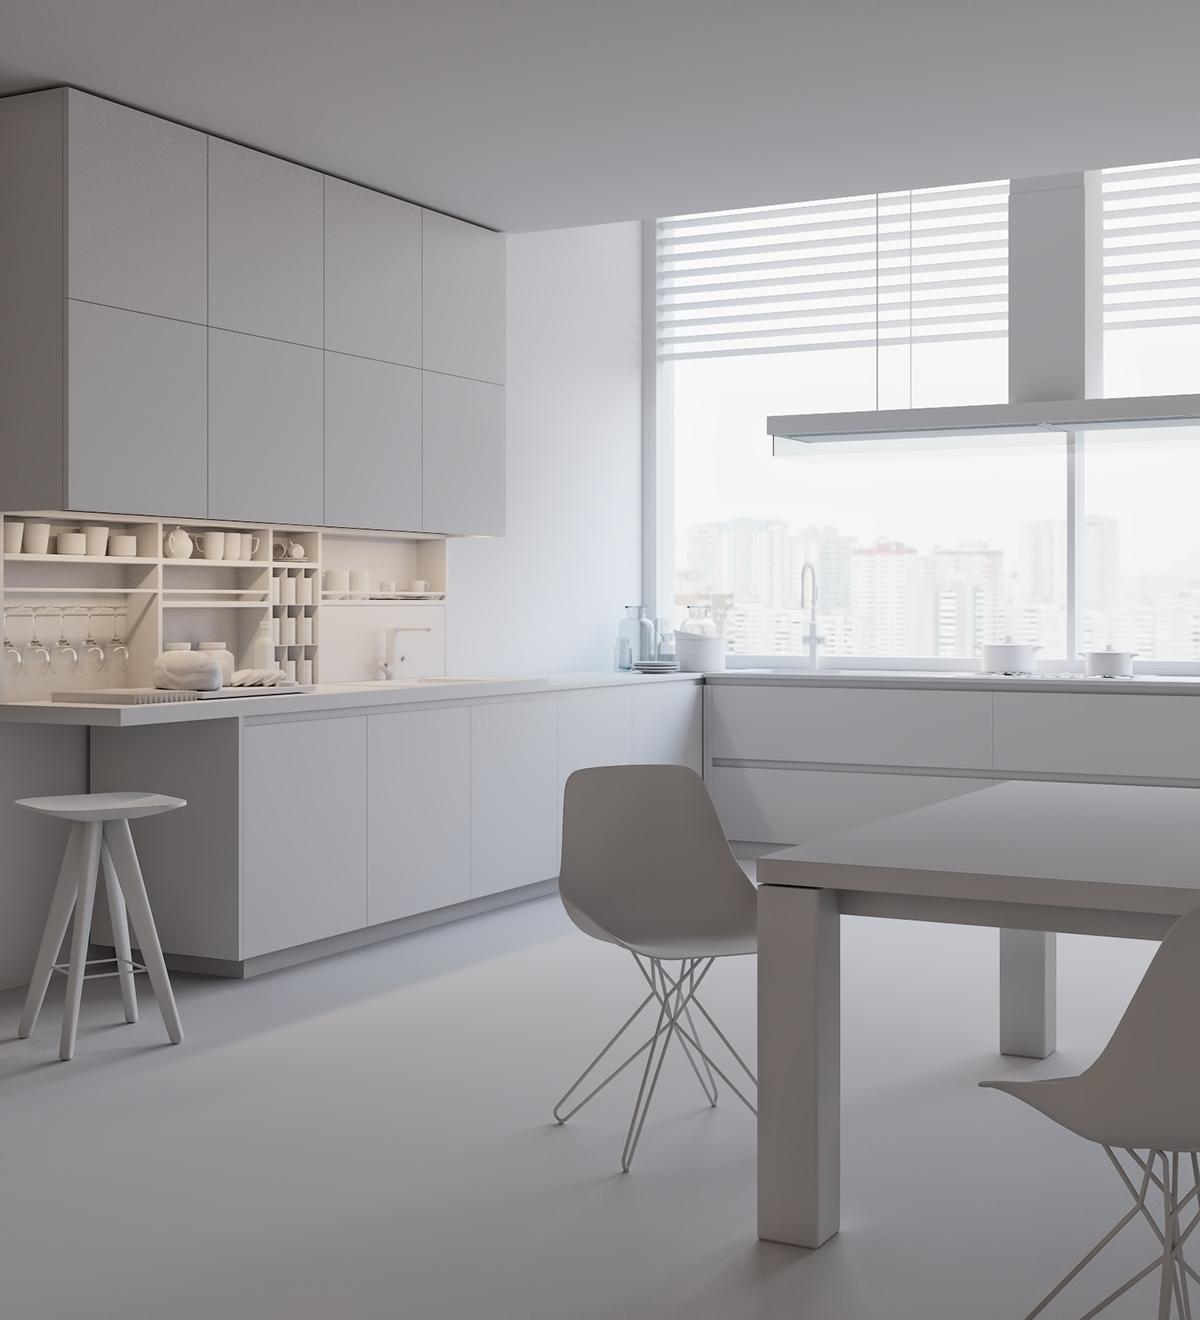 Kitchen. 3D Visualization (Poliform) On Behance